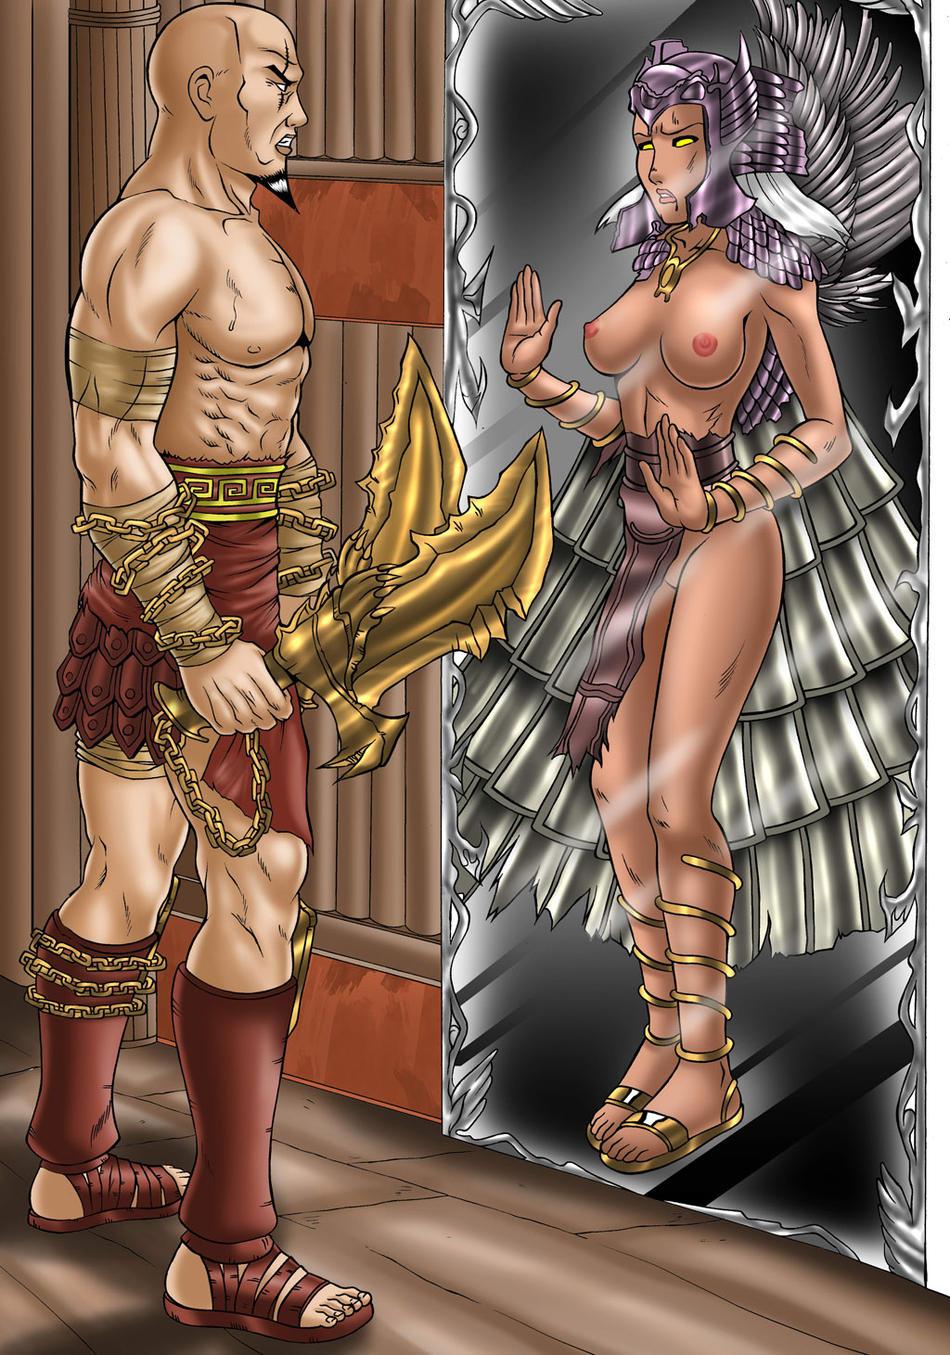 3 poseidon of god princess war How often do guys fap